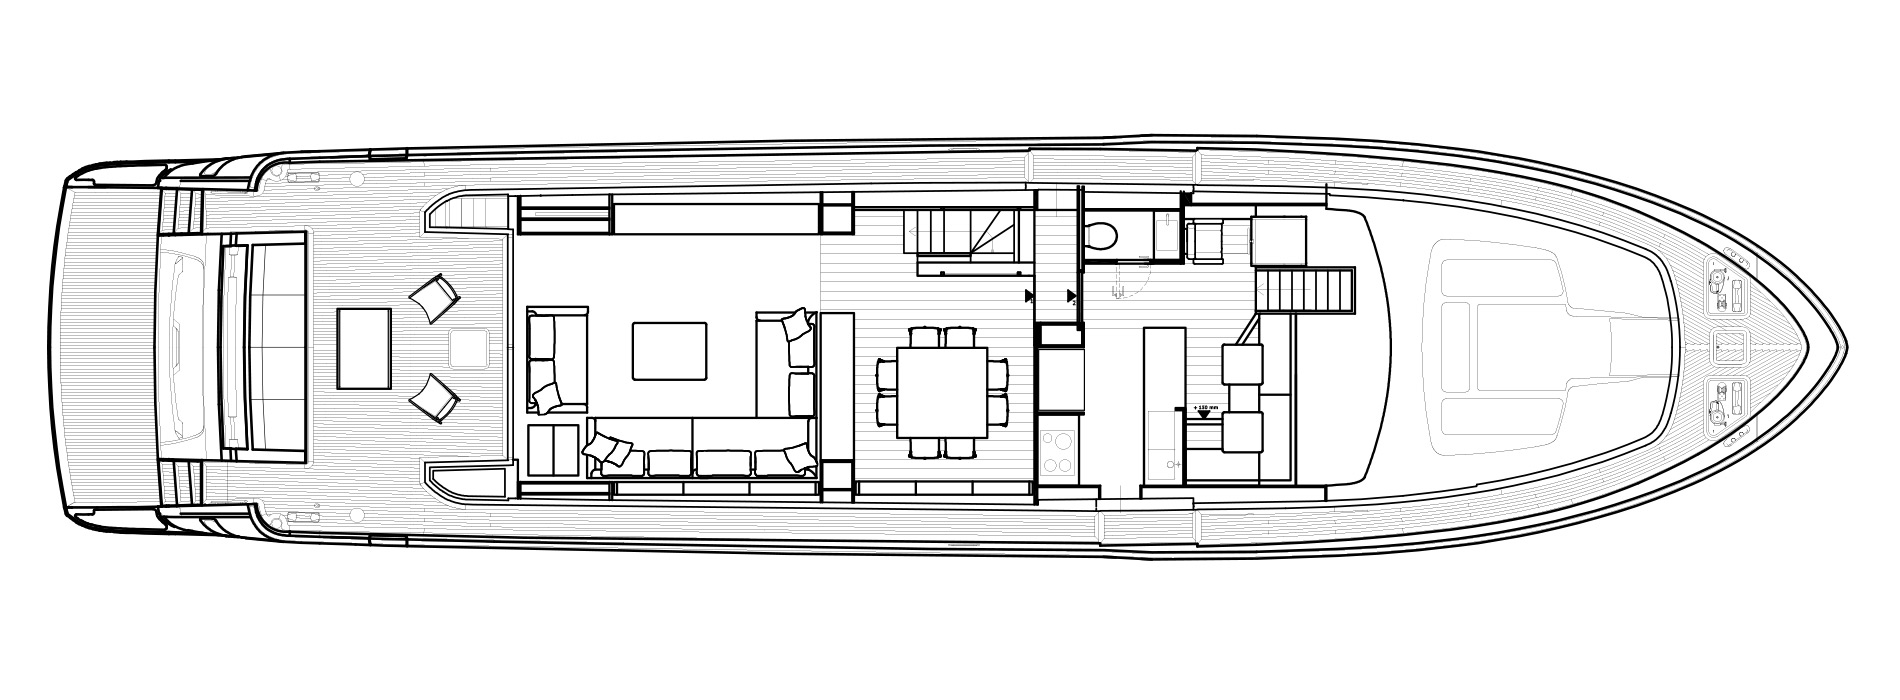 Sanlorenzo Yachts SL86 主甲板 Versione USA